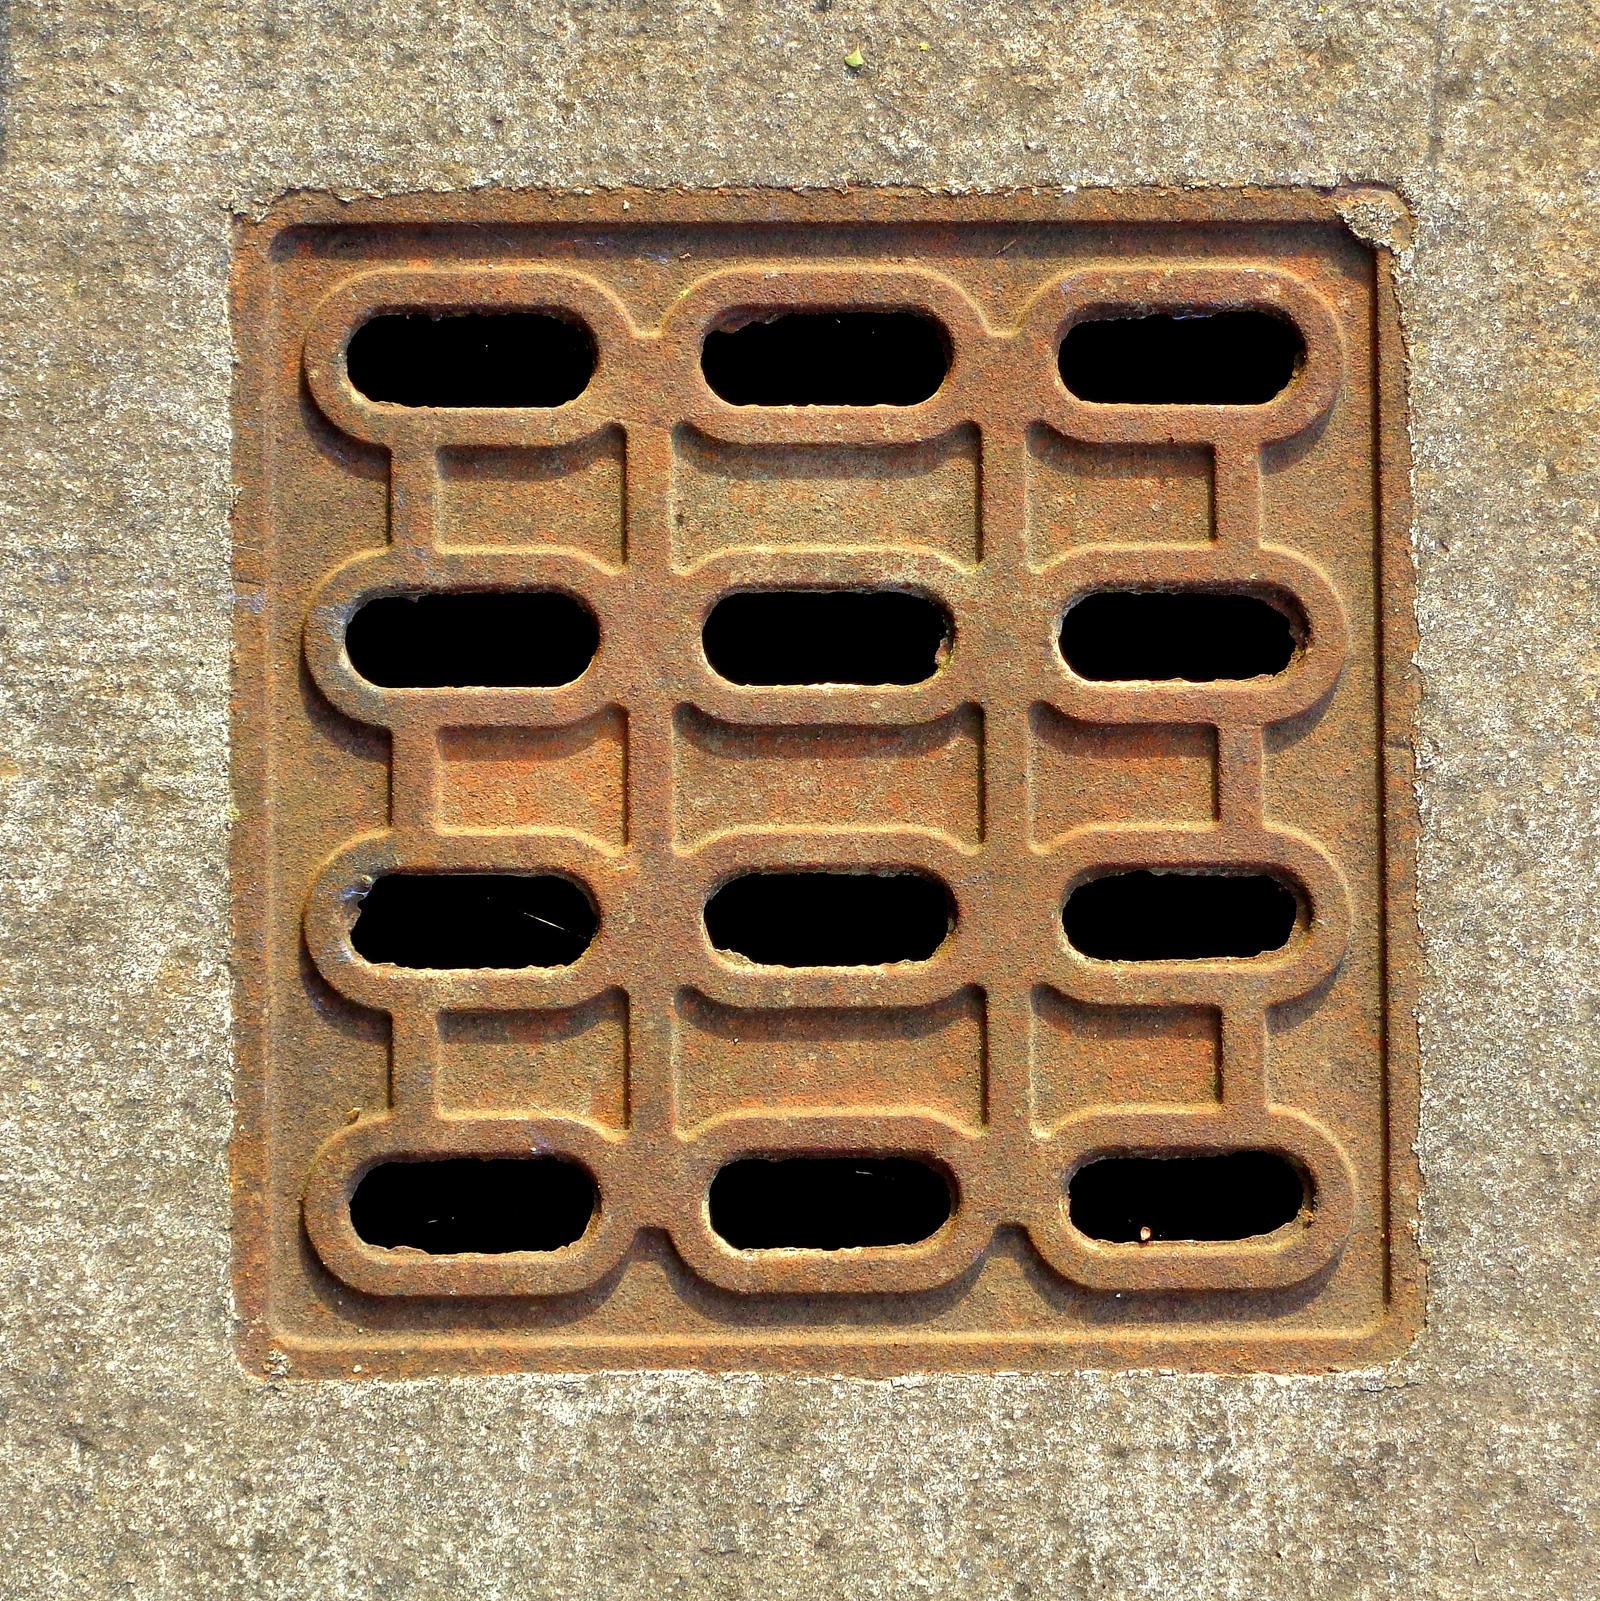 manhole cover by Mittelfranke